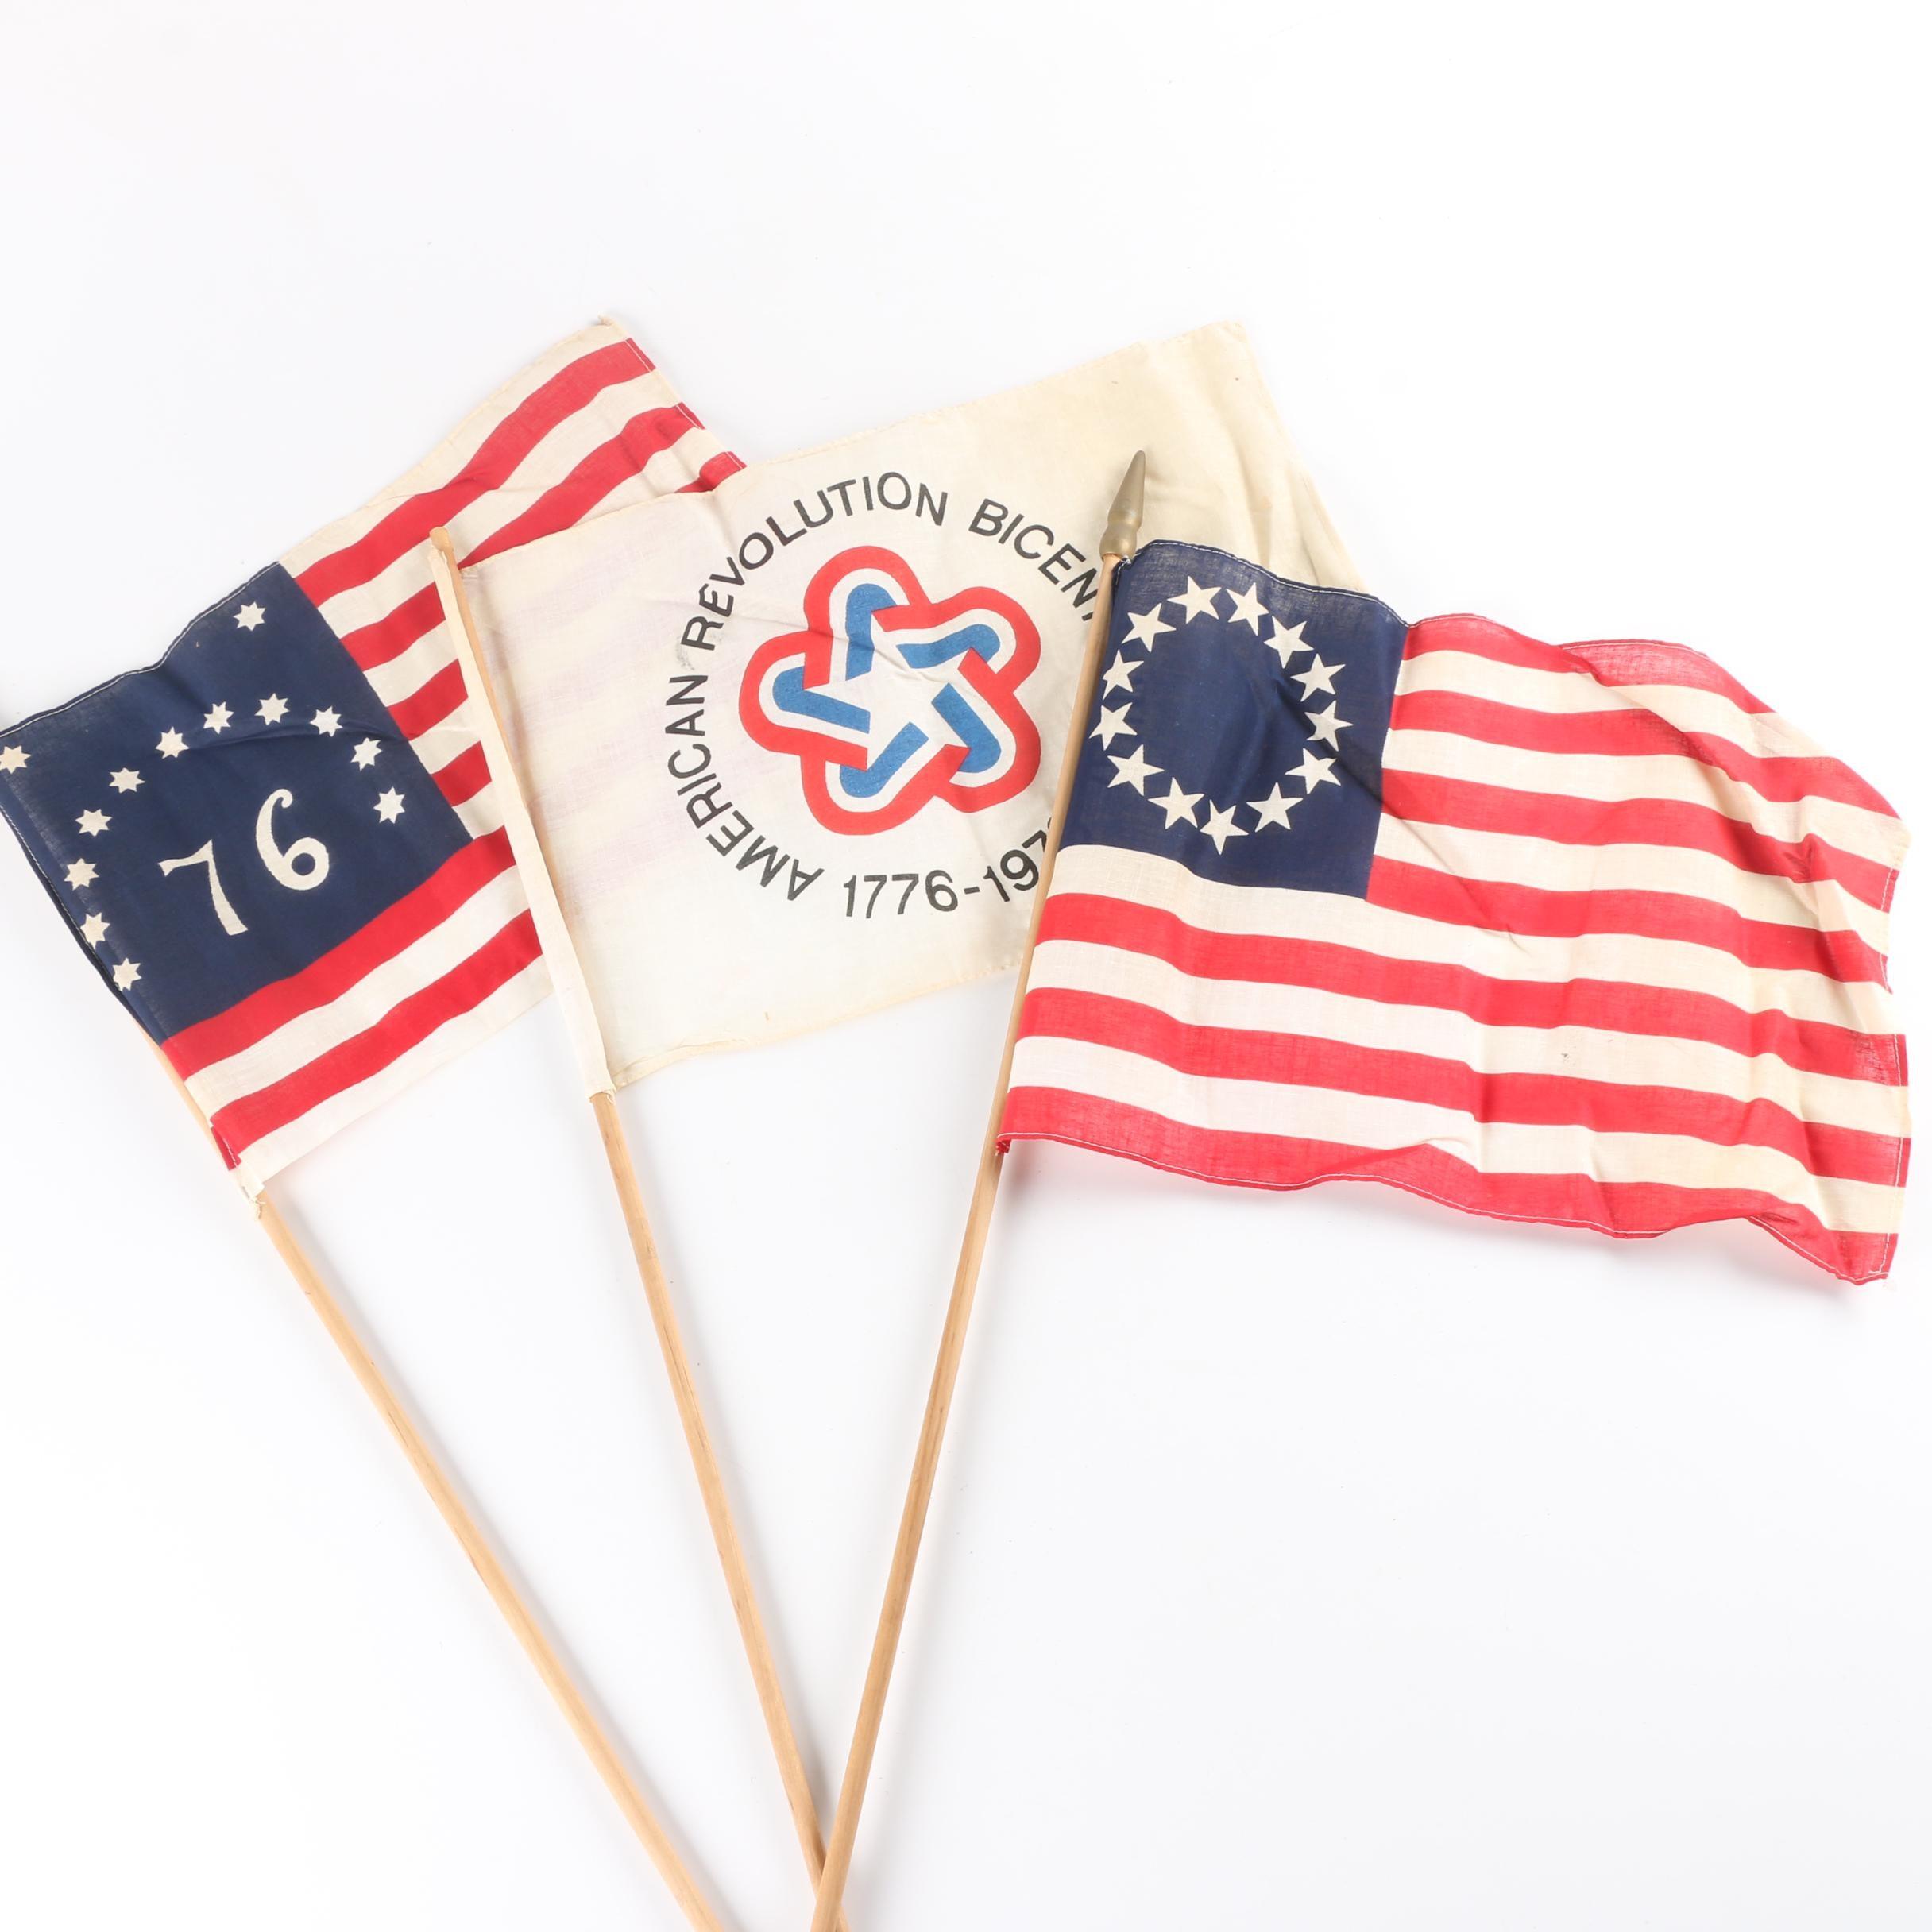 Thirteen Star American Flags and Bicentennial Flag on Dowels